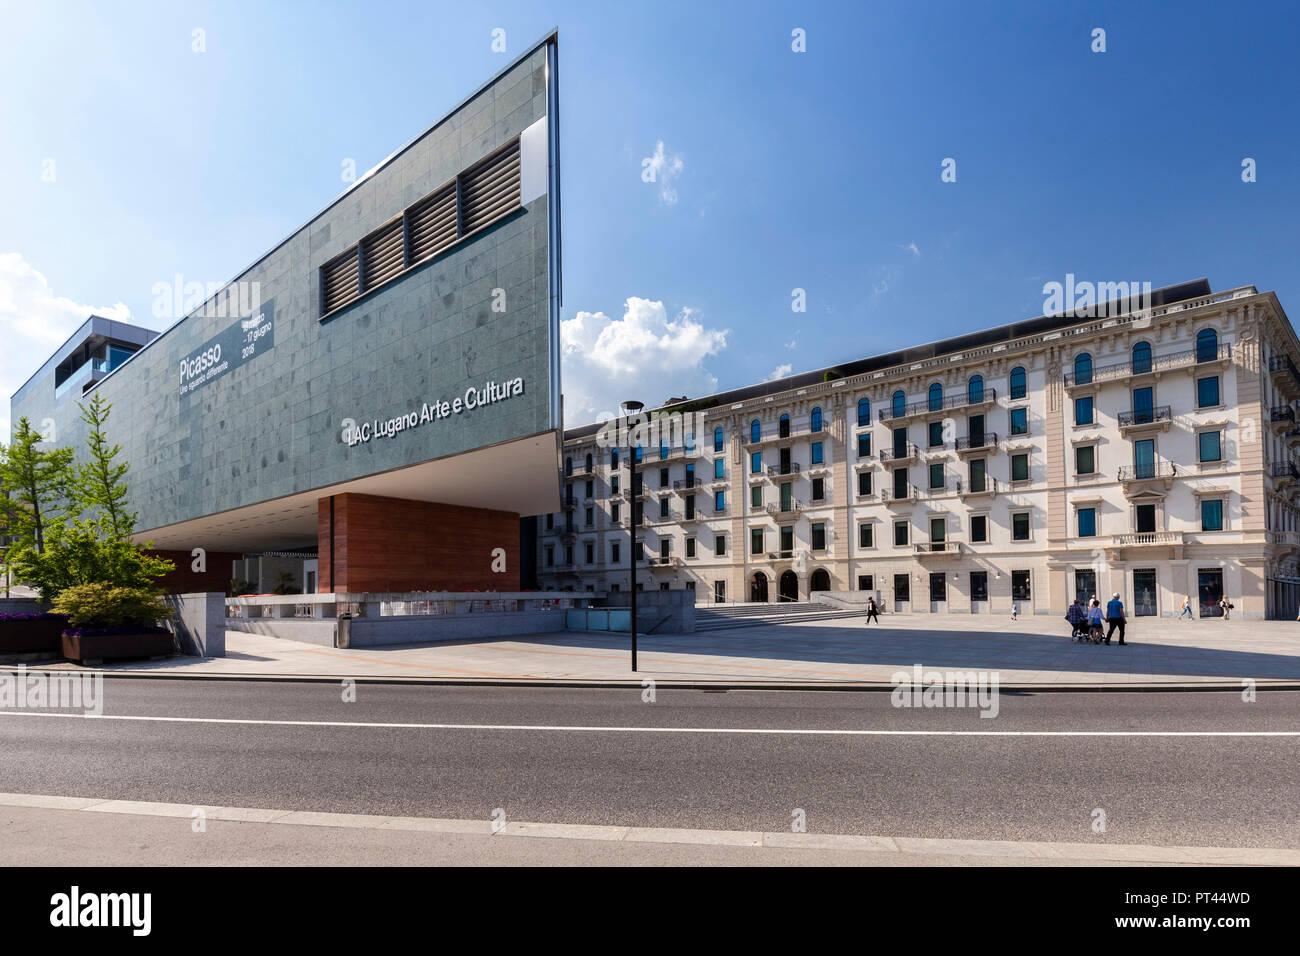 View of the Lugano Arte e Cultura center in downtown Lugano on a spring day, Canton Ticino, Switzerland, - Stock Image